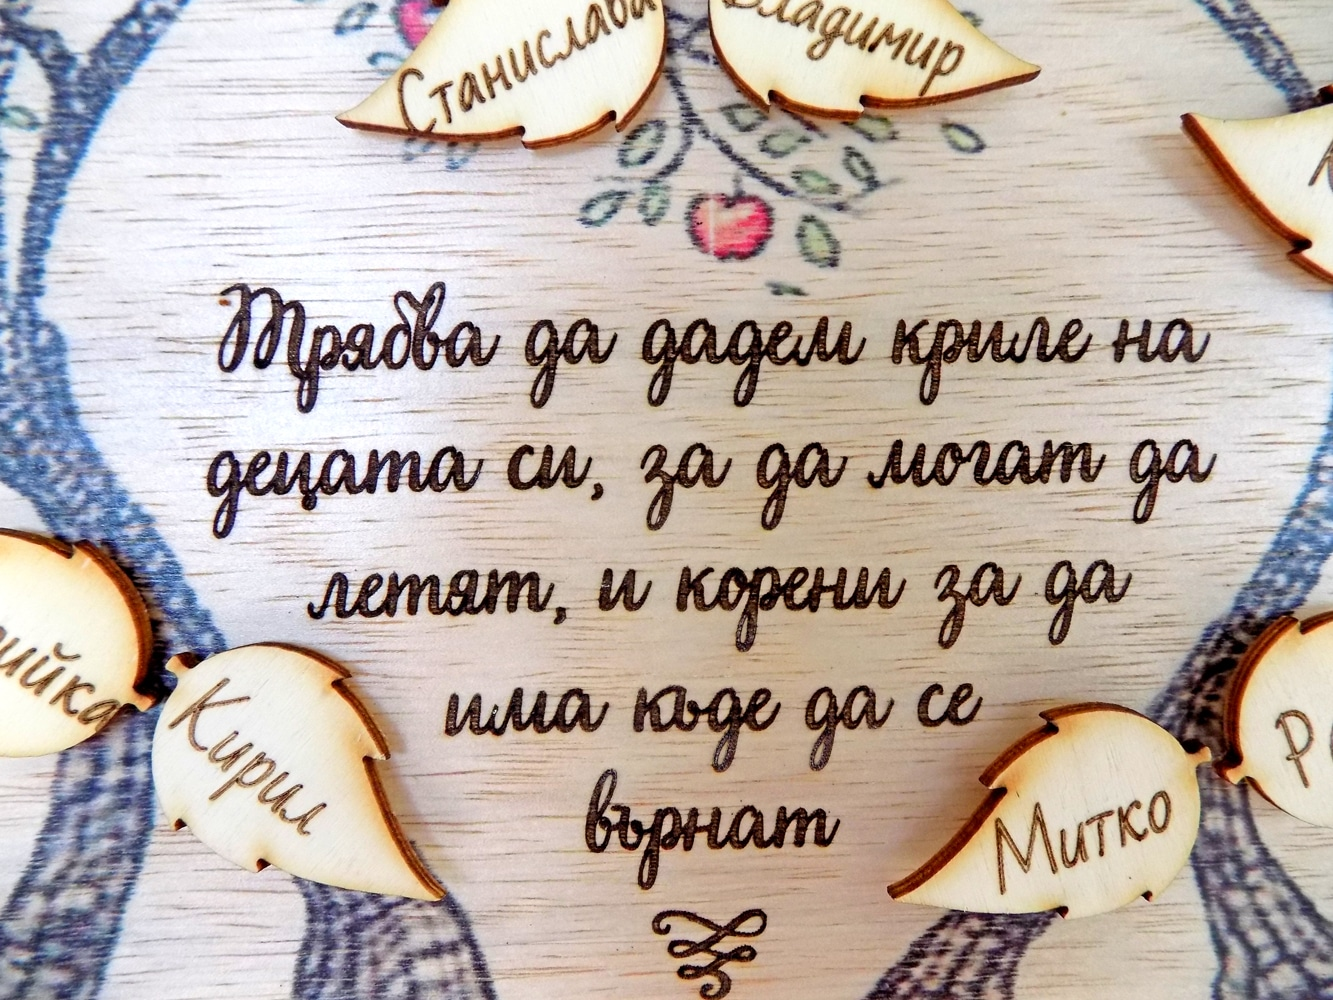 Красив цитат